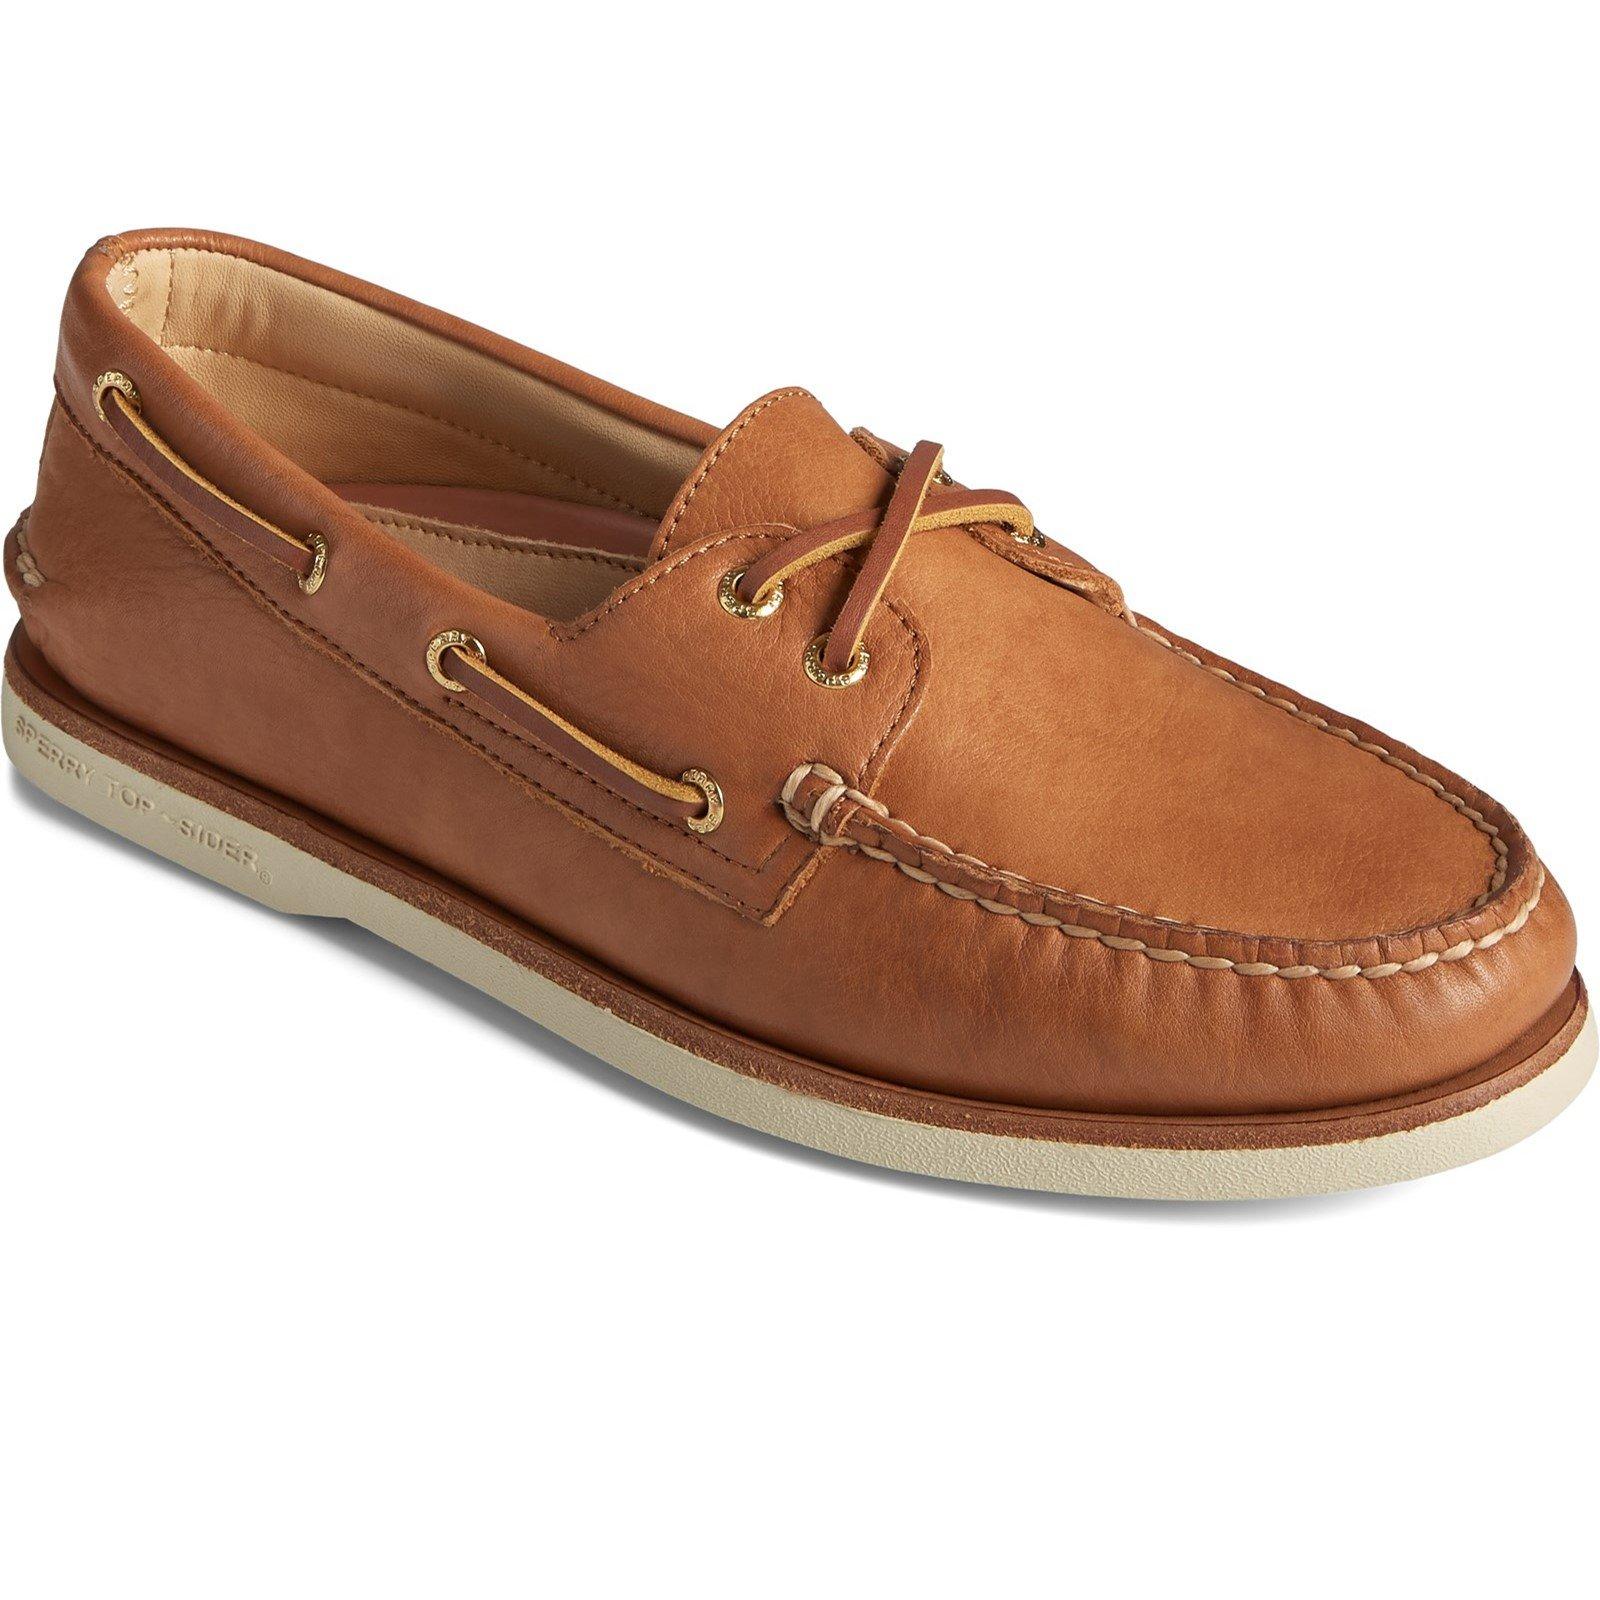 Sperry Men's A/O 2-Eye Boat Shoe Various Colours 32926 - Tan 11